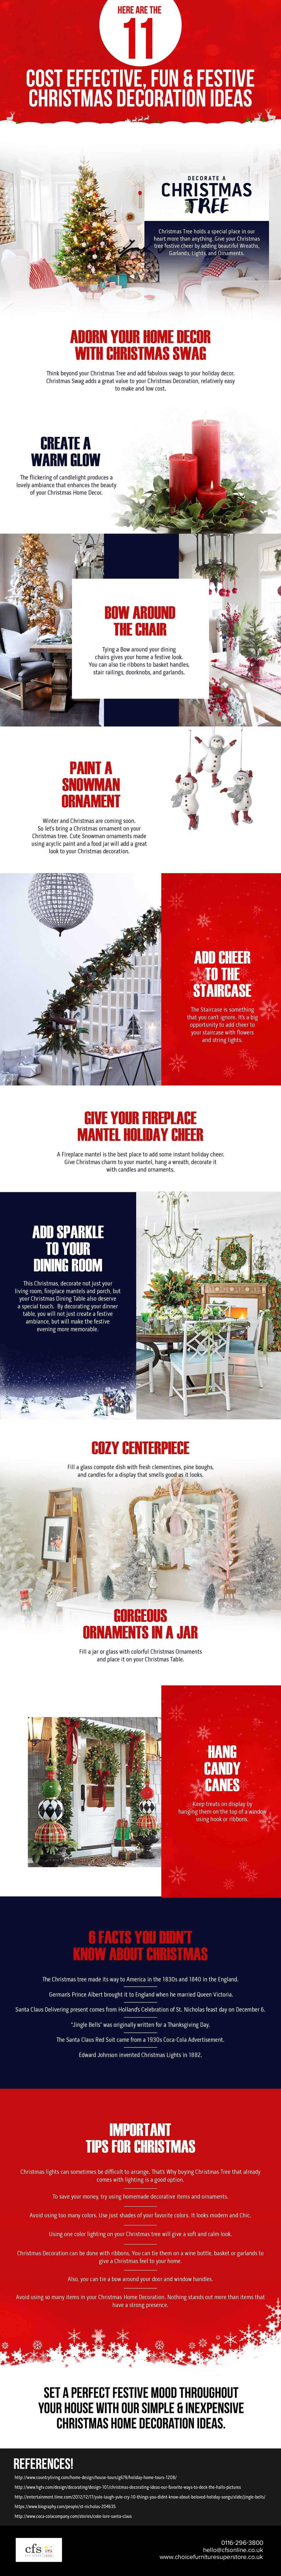 11 Fun Festive Christmas Decoration Ideas